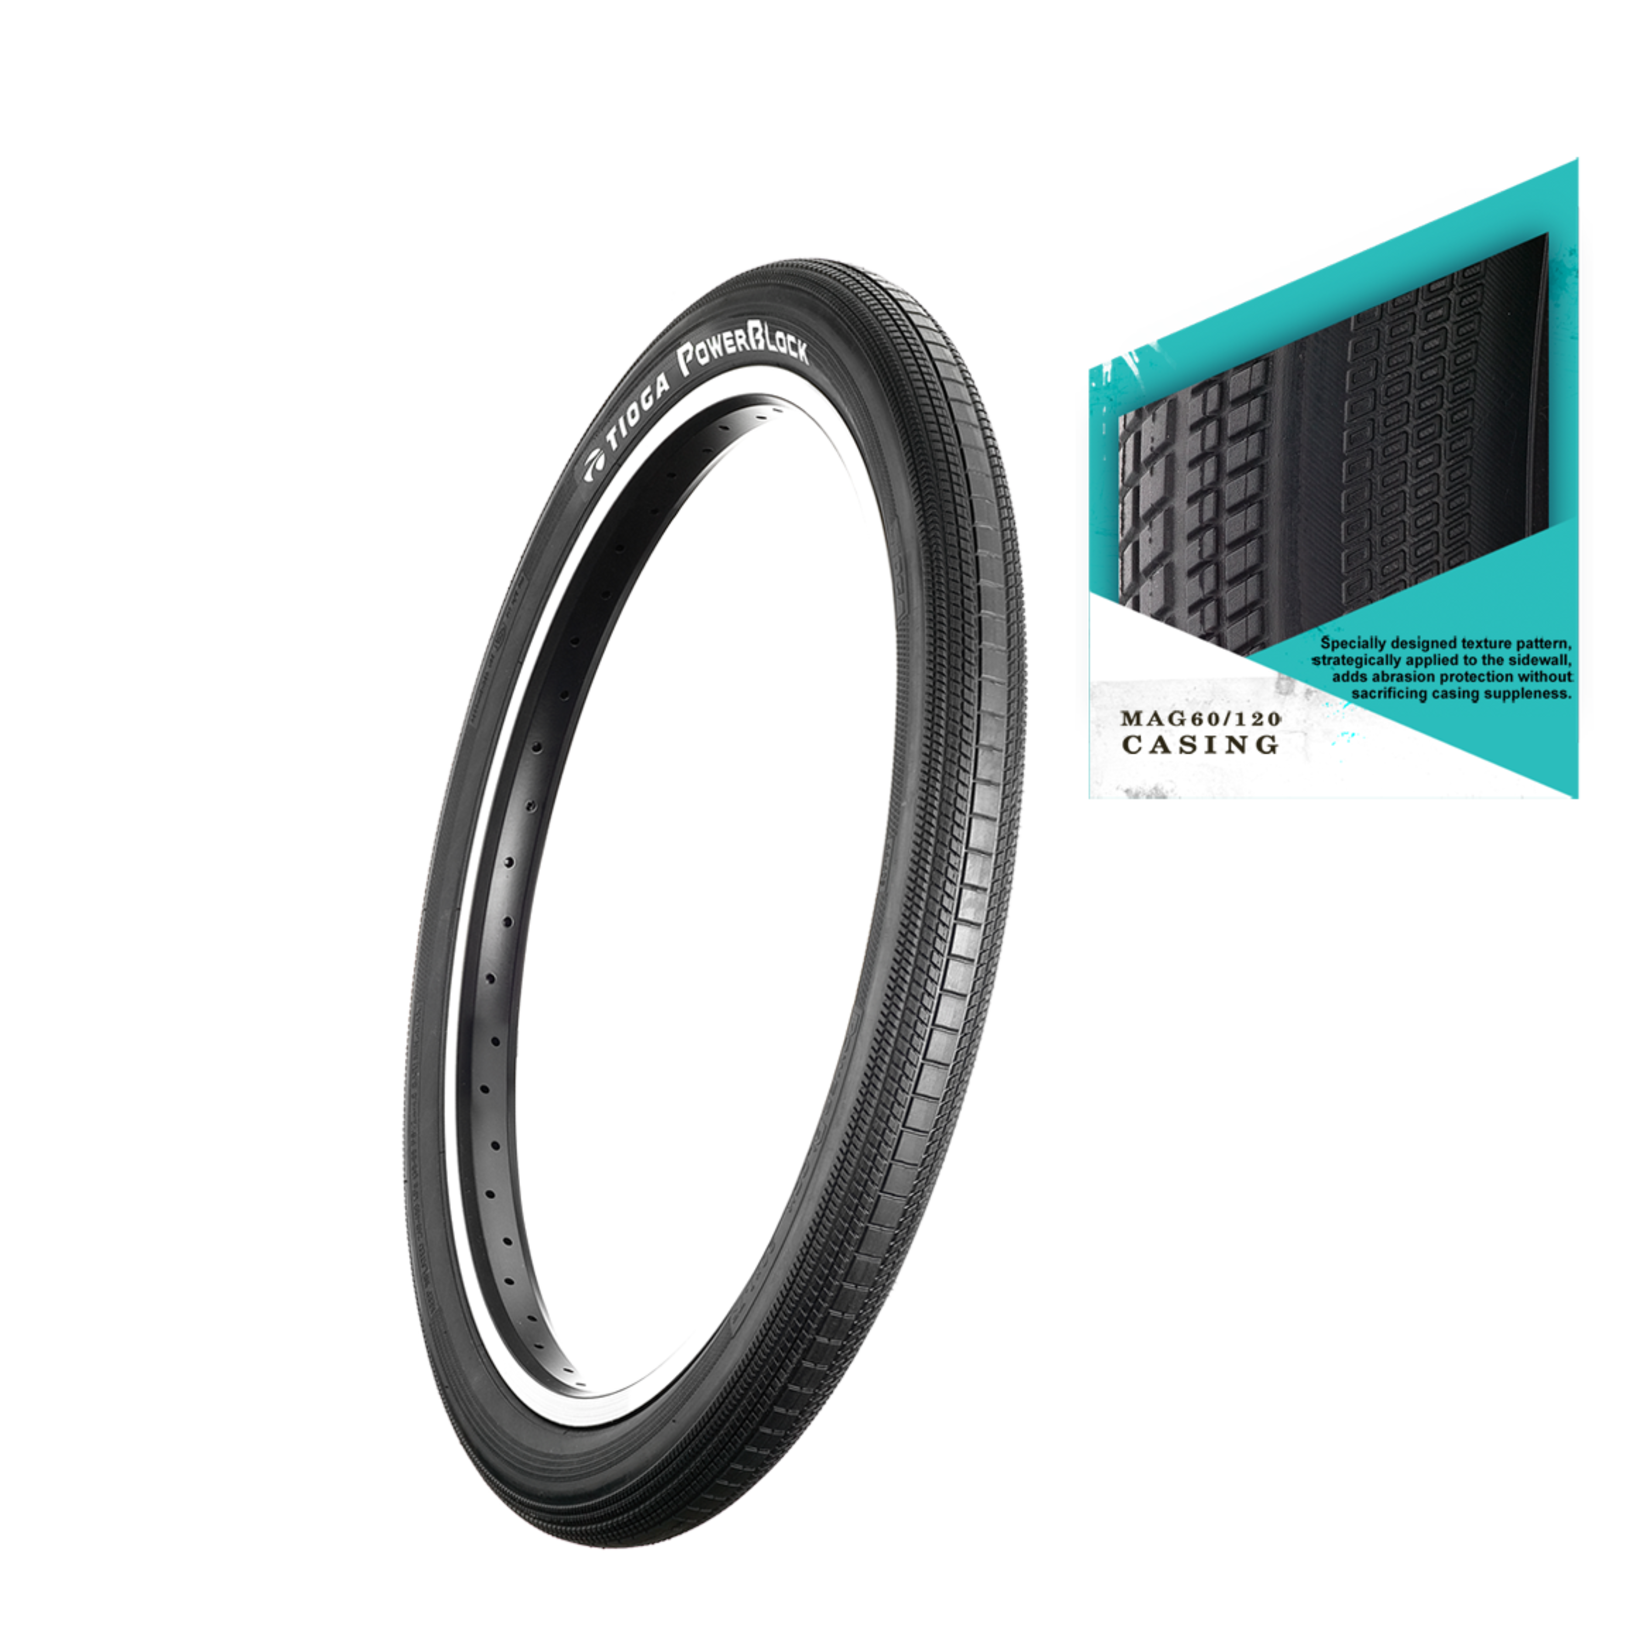 Tioga Tioga Tires RP Powerblock Wire Black